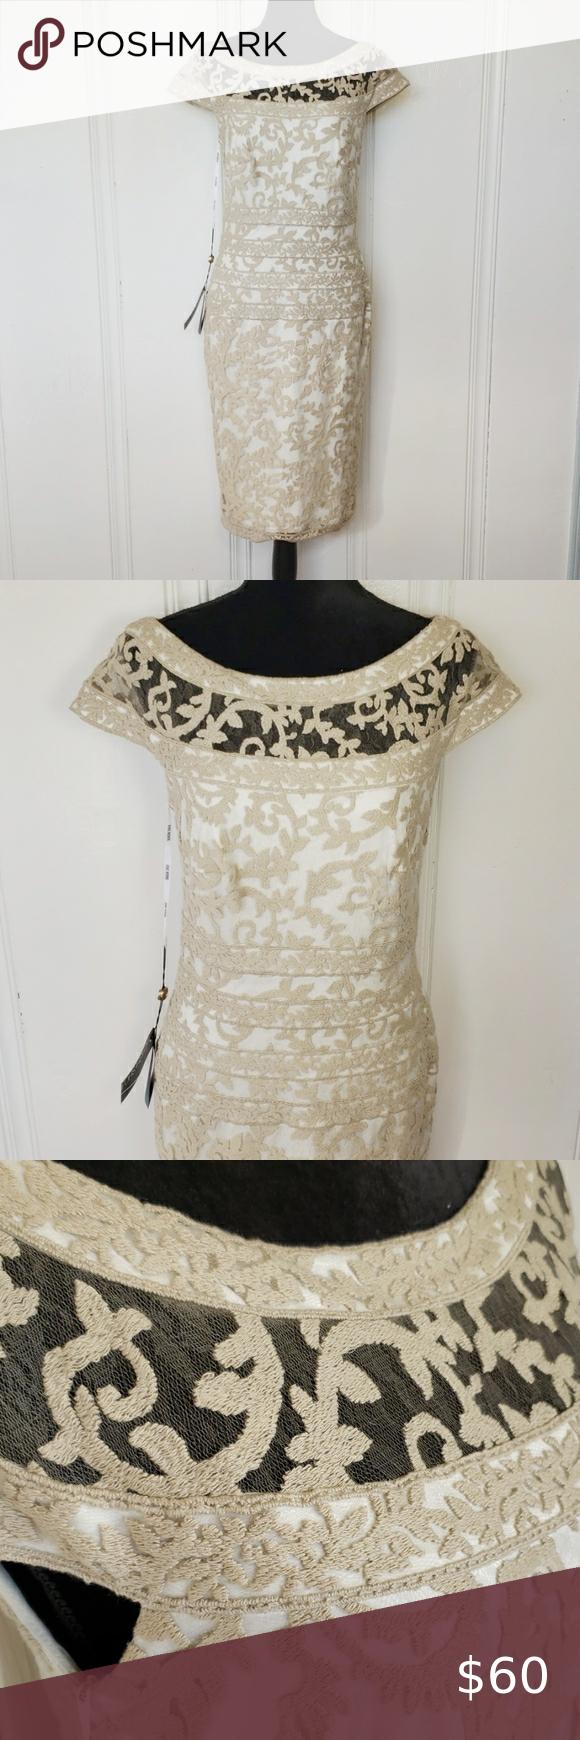 Nwt Tadashi Shoji Boatneck Lace Overlay Dress In 2020 Lace Overlay Dress Gold Long Sleeve Dress Lace Peplum Dress [ 1740 x 580 Pixel ]